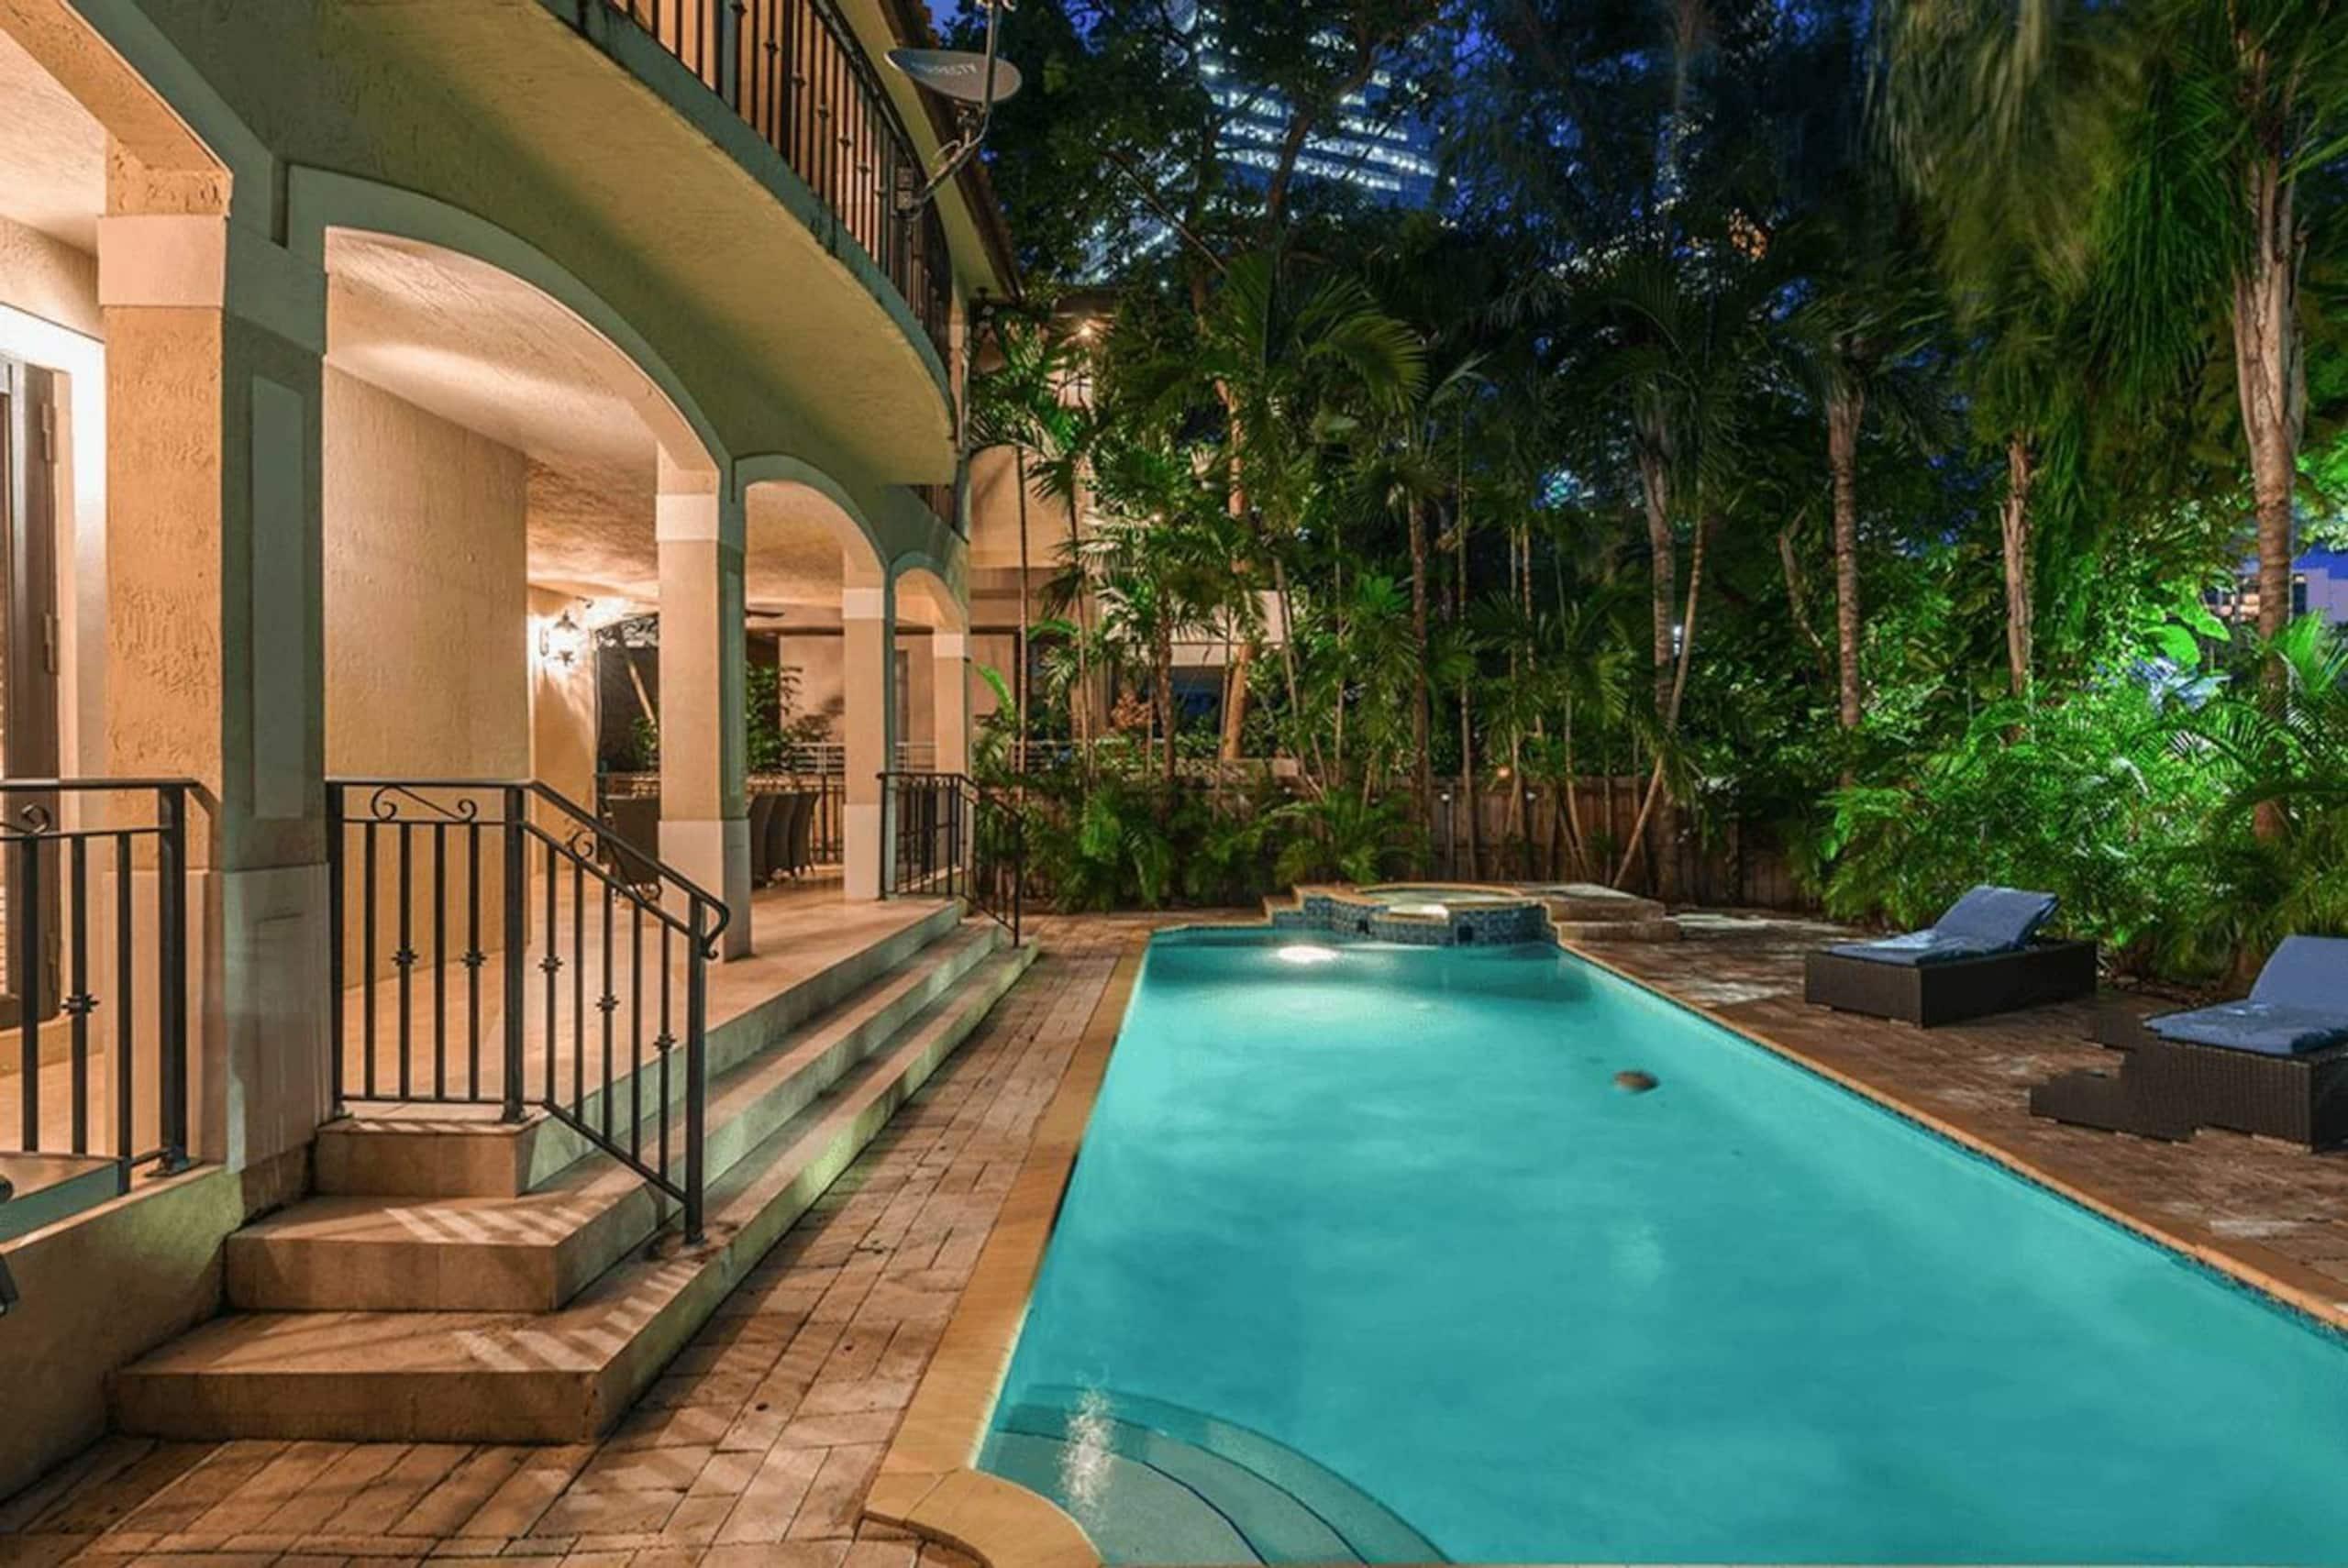 Apartment Villa Lawrence - Luxury Villa photo 22682477